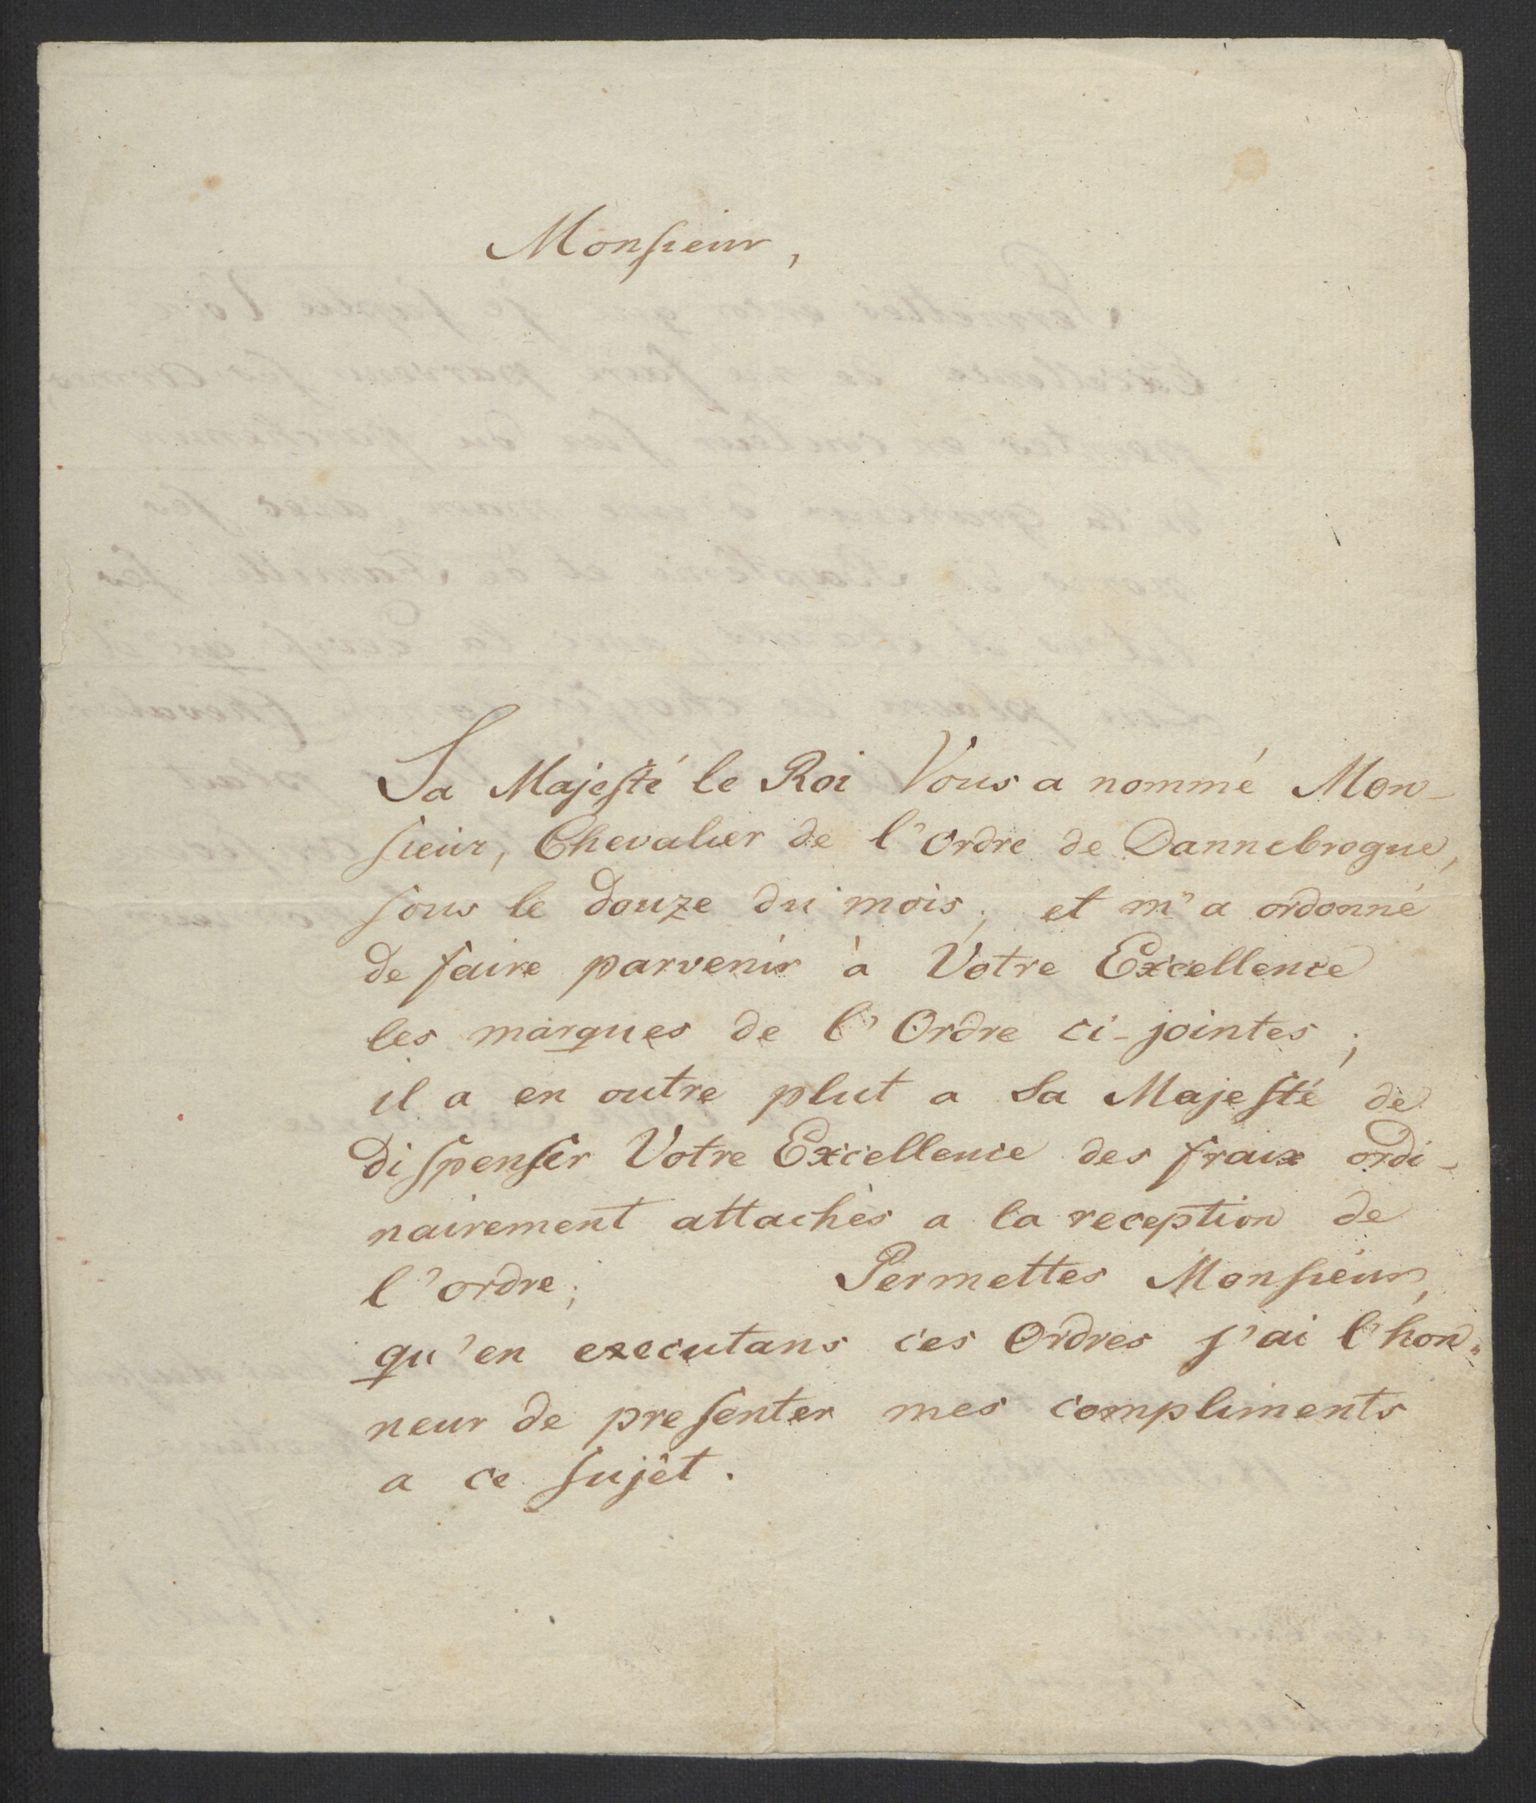 RA, Hesselberg, Hans Jacob Henning, F/L0001: --, 1759-1809, p. 88